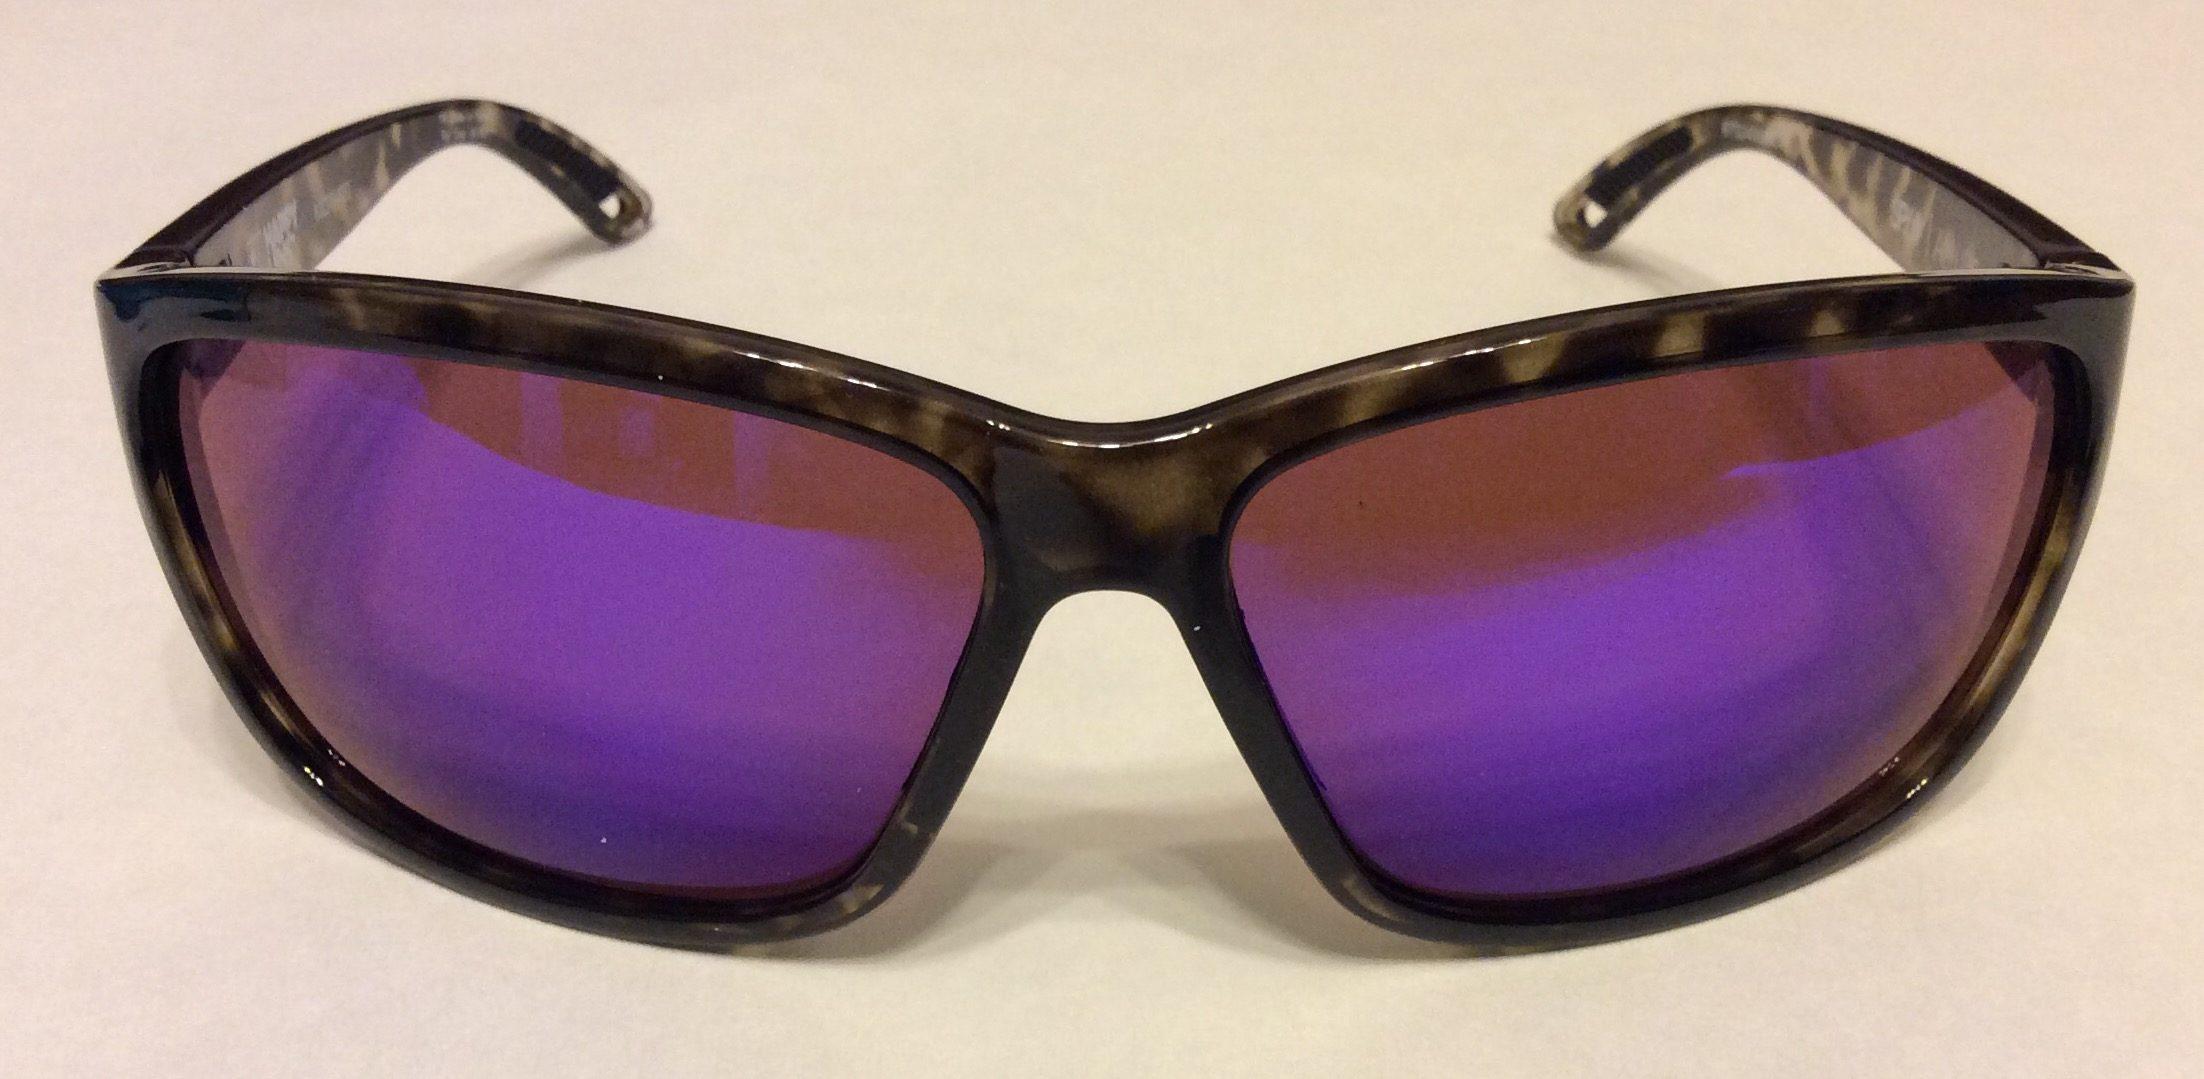 Spy Optics Allure Sunglasses Smoke Tortoise Frame